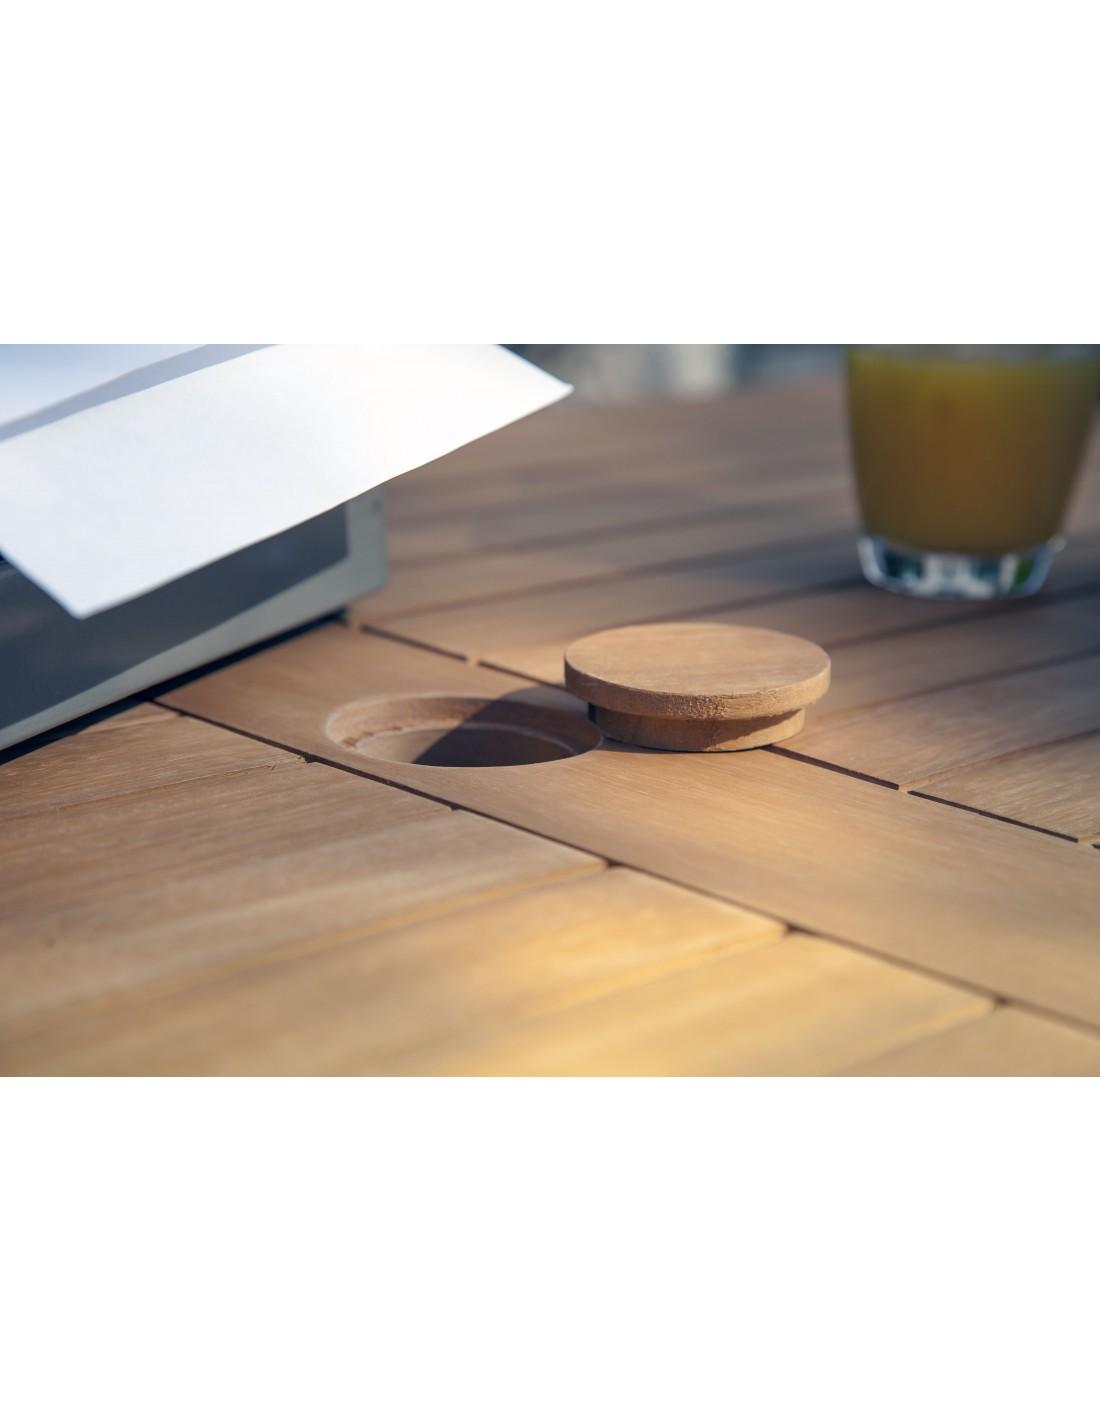 Awesome salon de jardin en bois d eucalyptus photos - Table jardin pliante bois ...